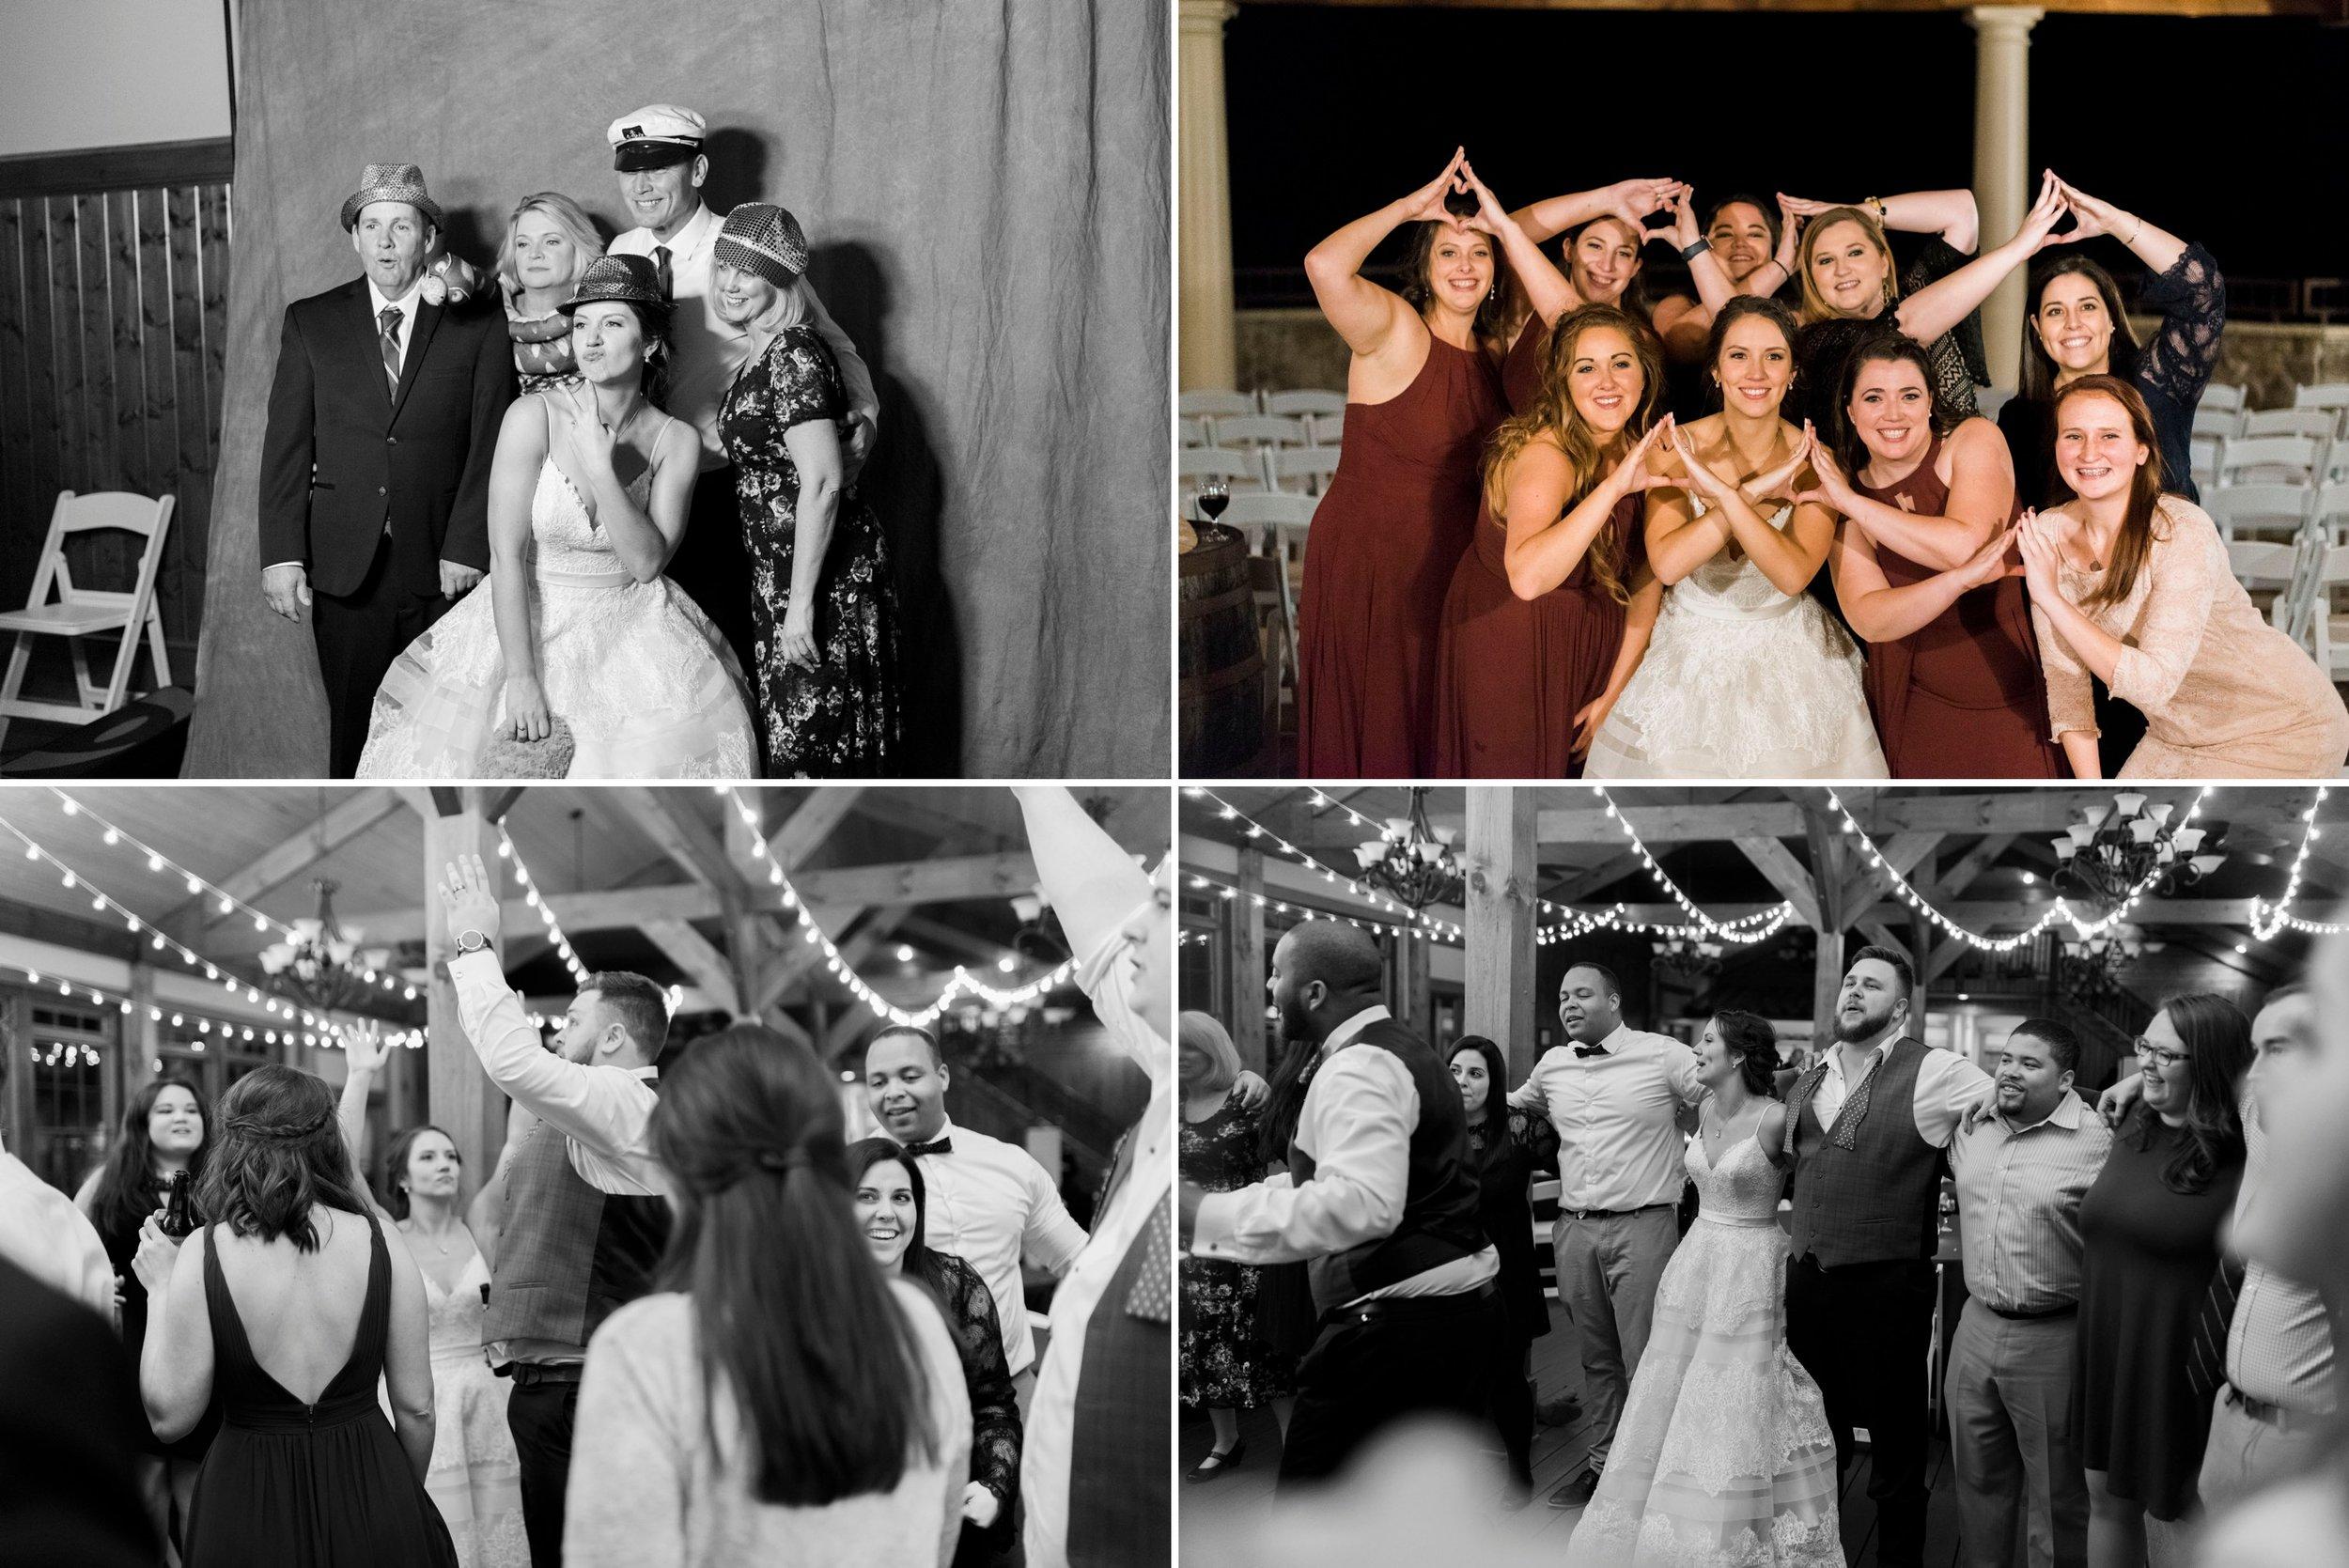 IrvineEstate_LexingtonVA_Wedding_FallWedding_VirginiaWeddingPhotographer 108.jpg